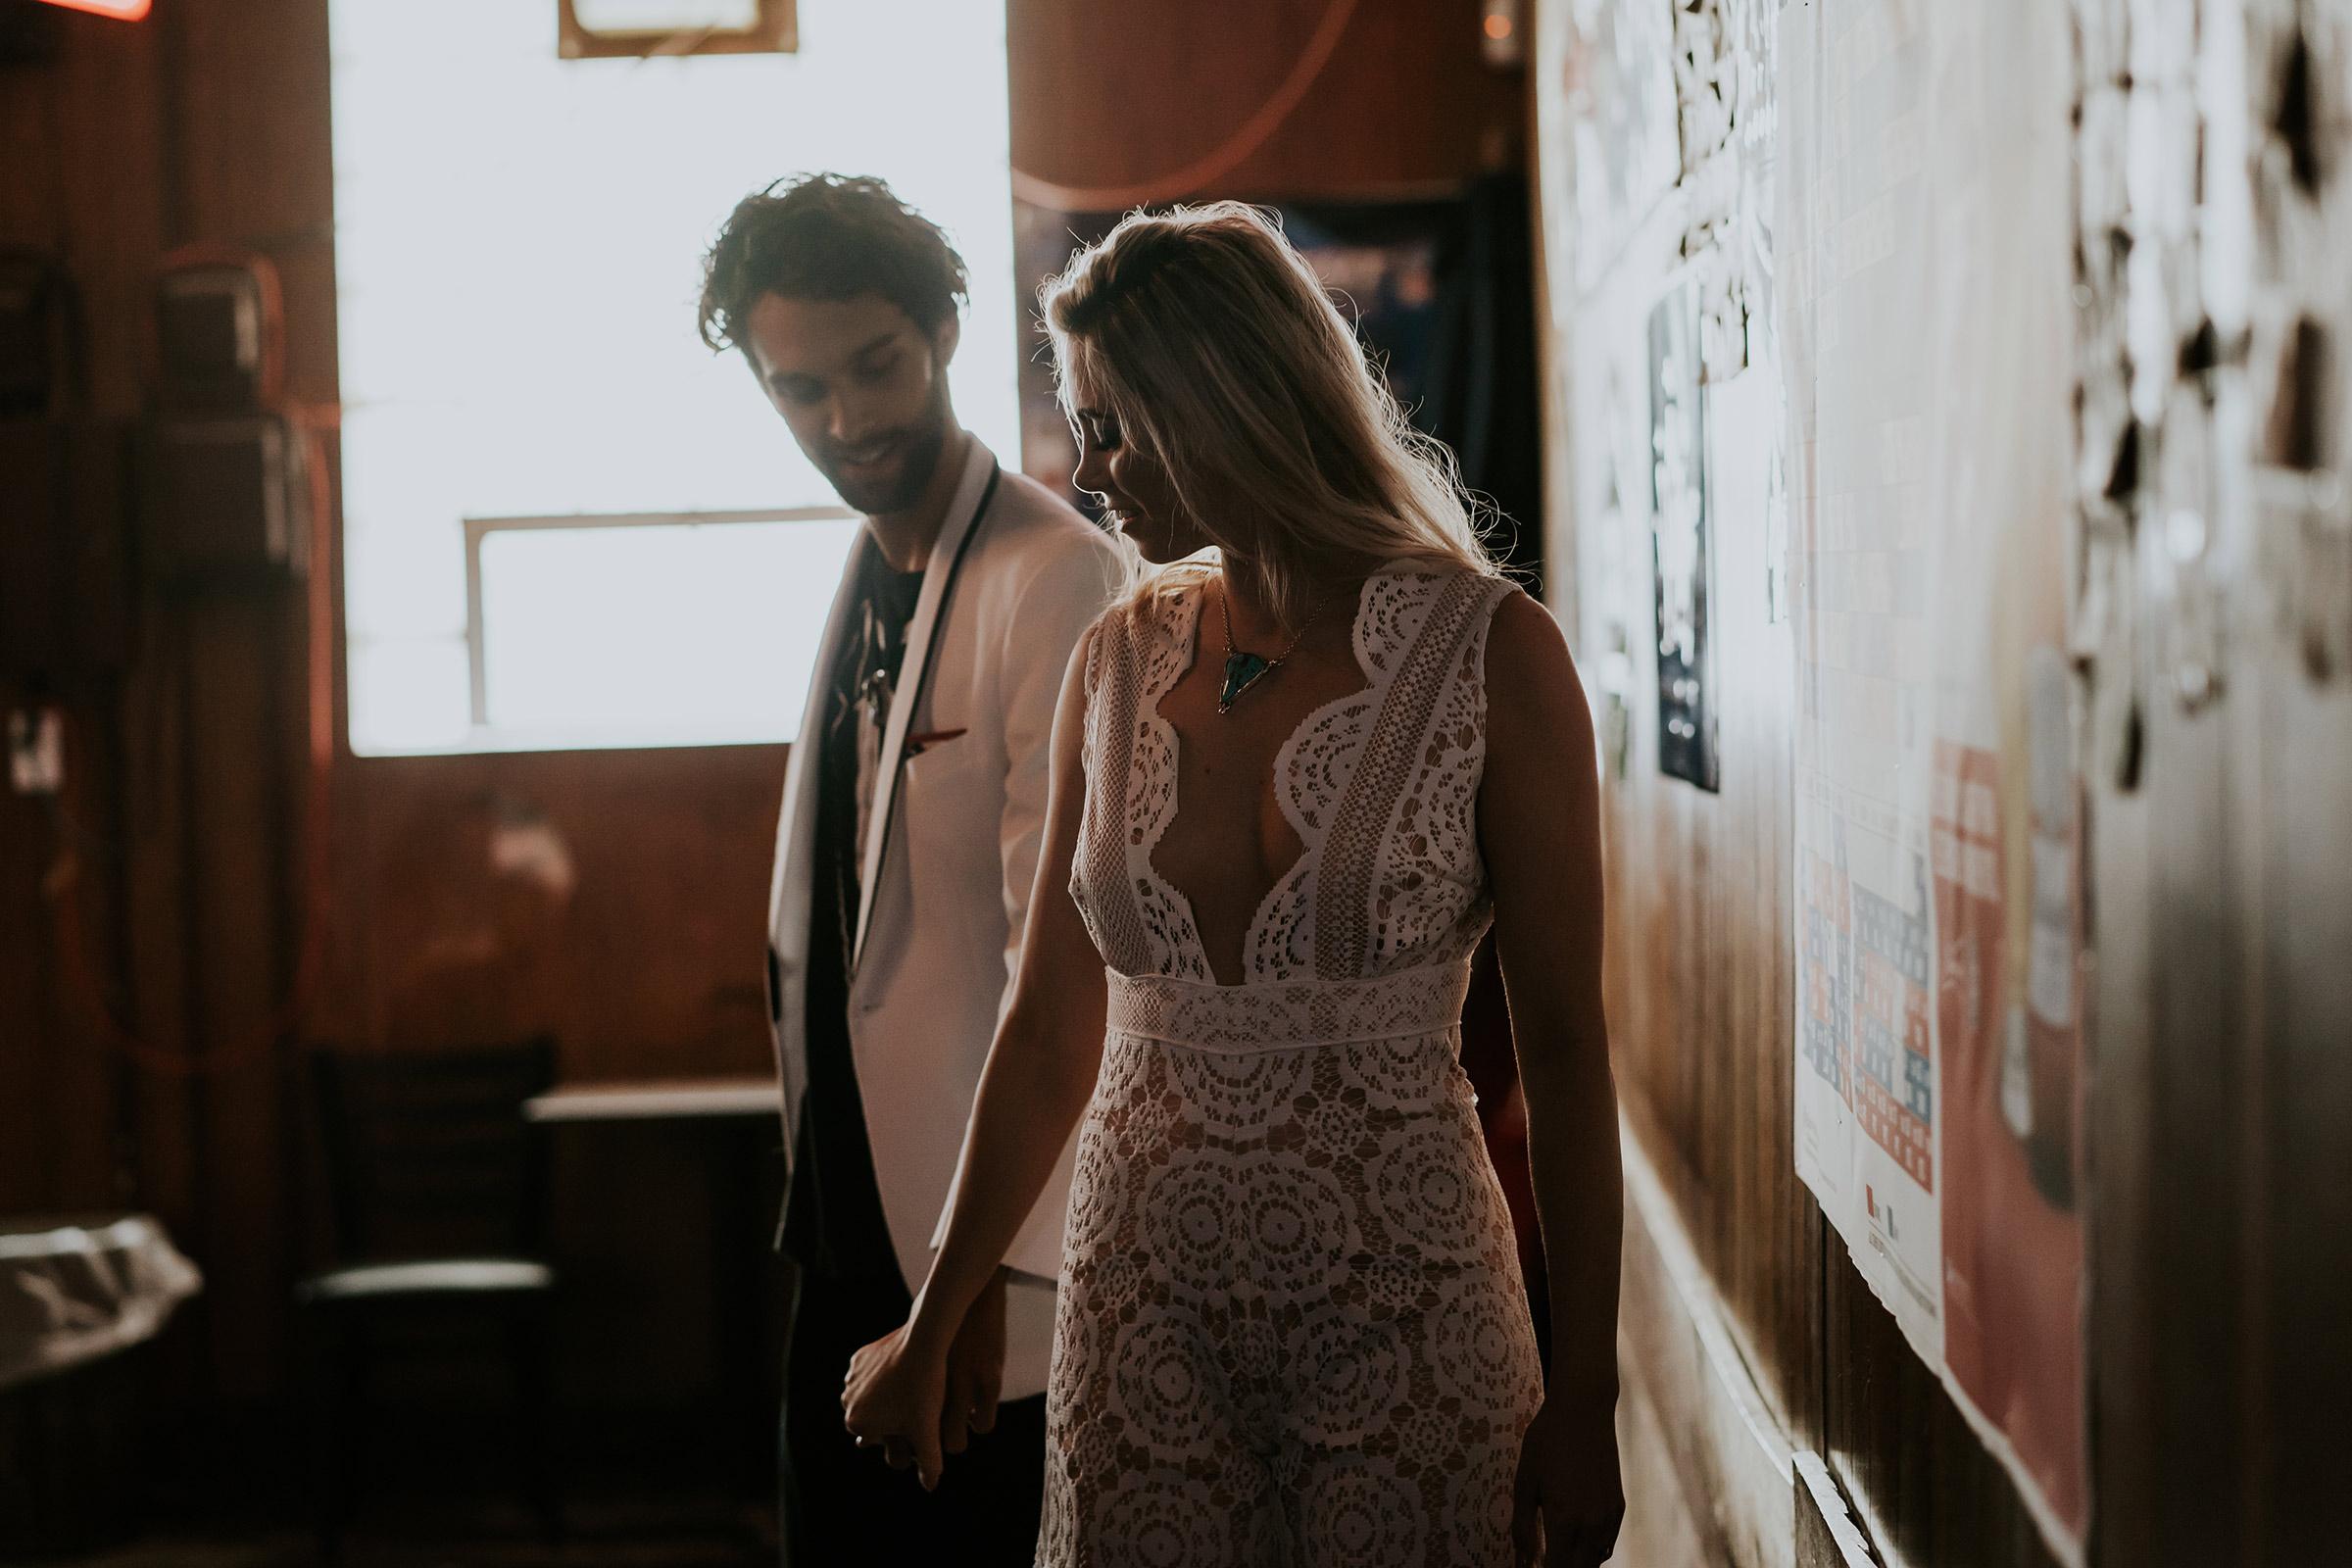 bride-and-groom-at-clarks-bar-iowa-road-trip-romance-wedding-raelyn-ramey-photography-99.jpg